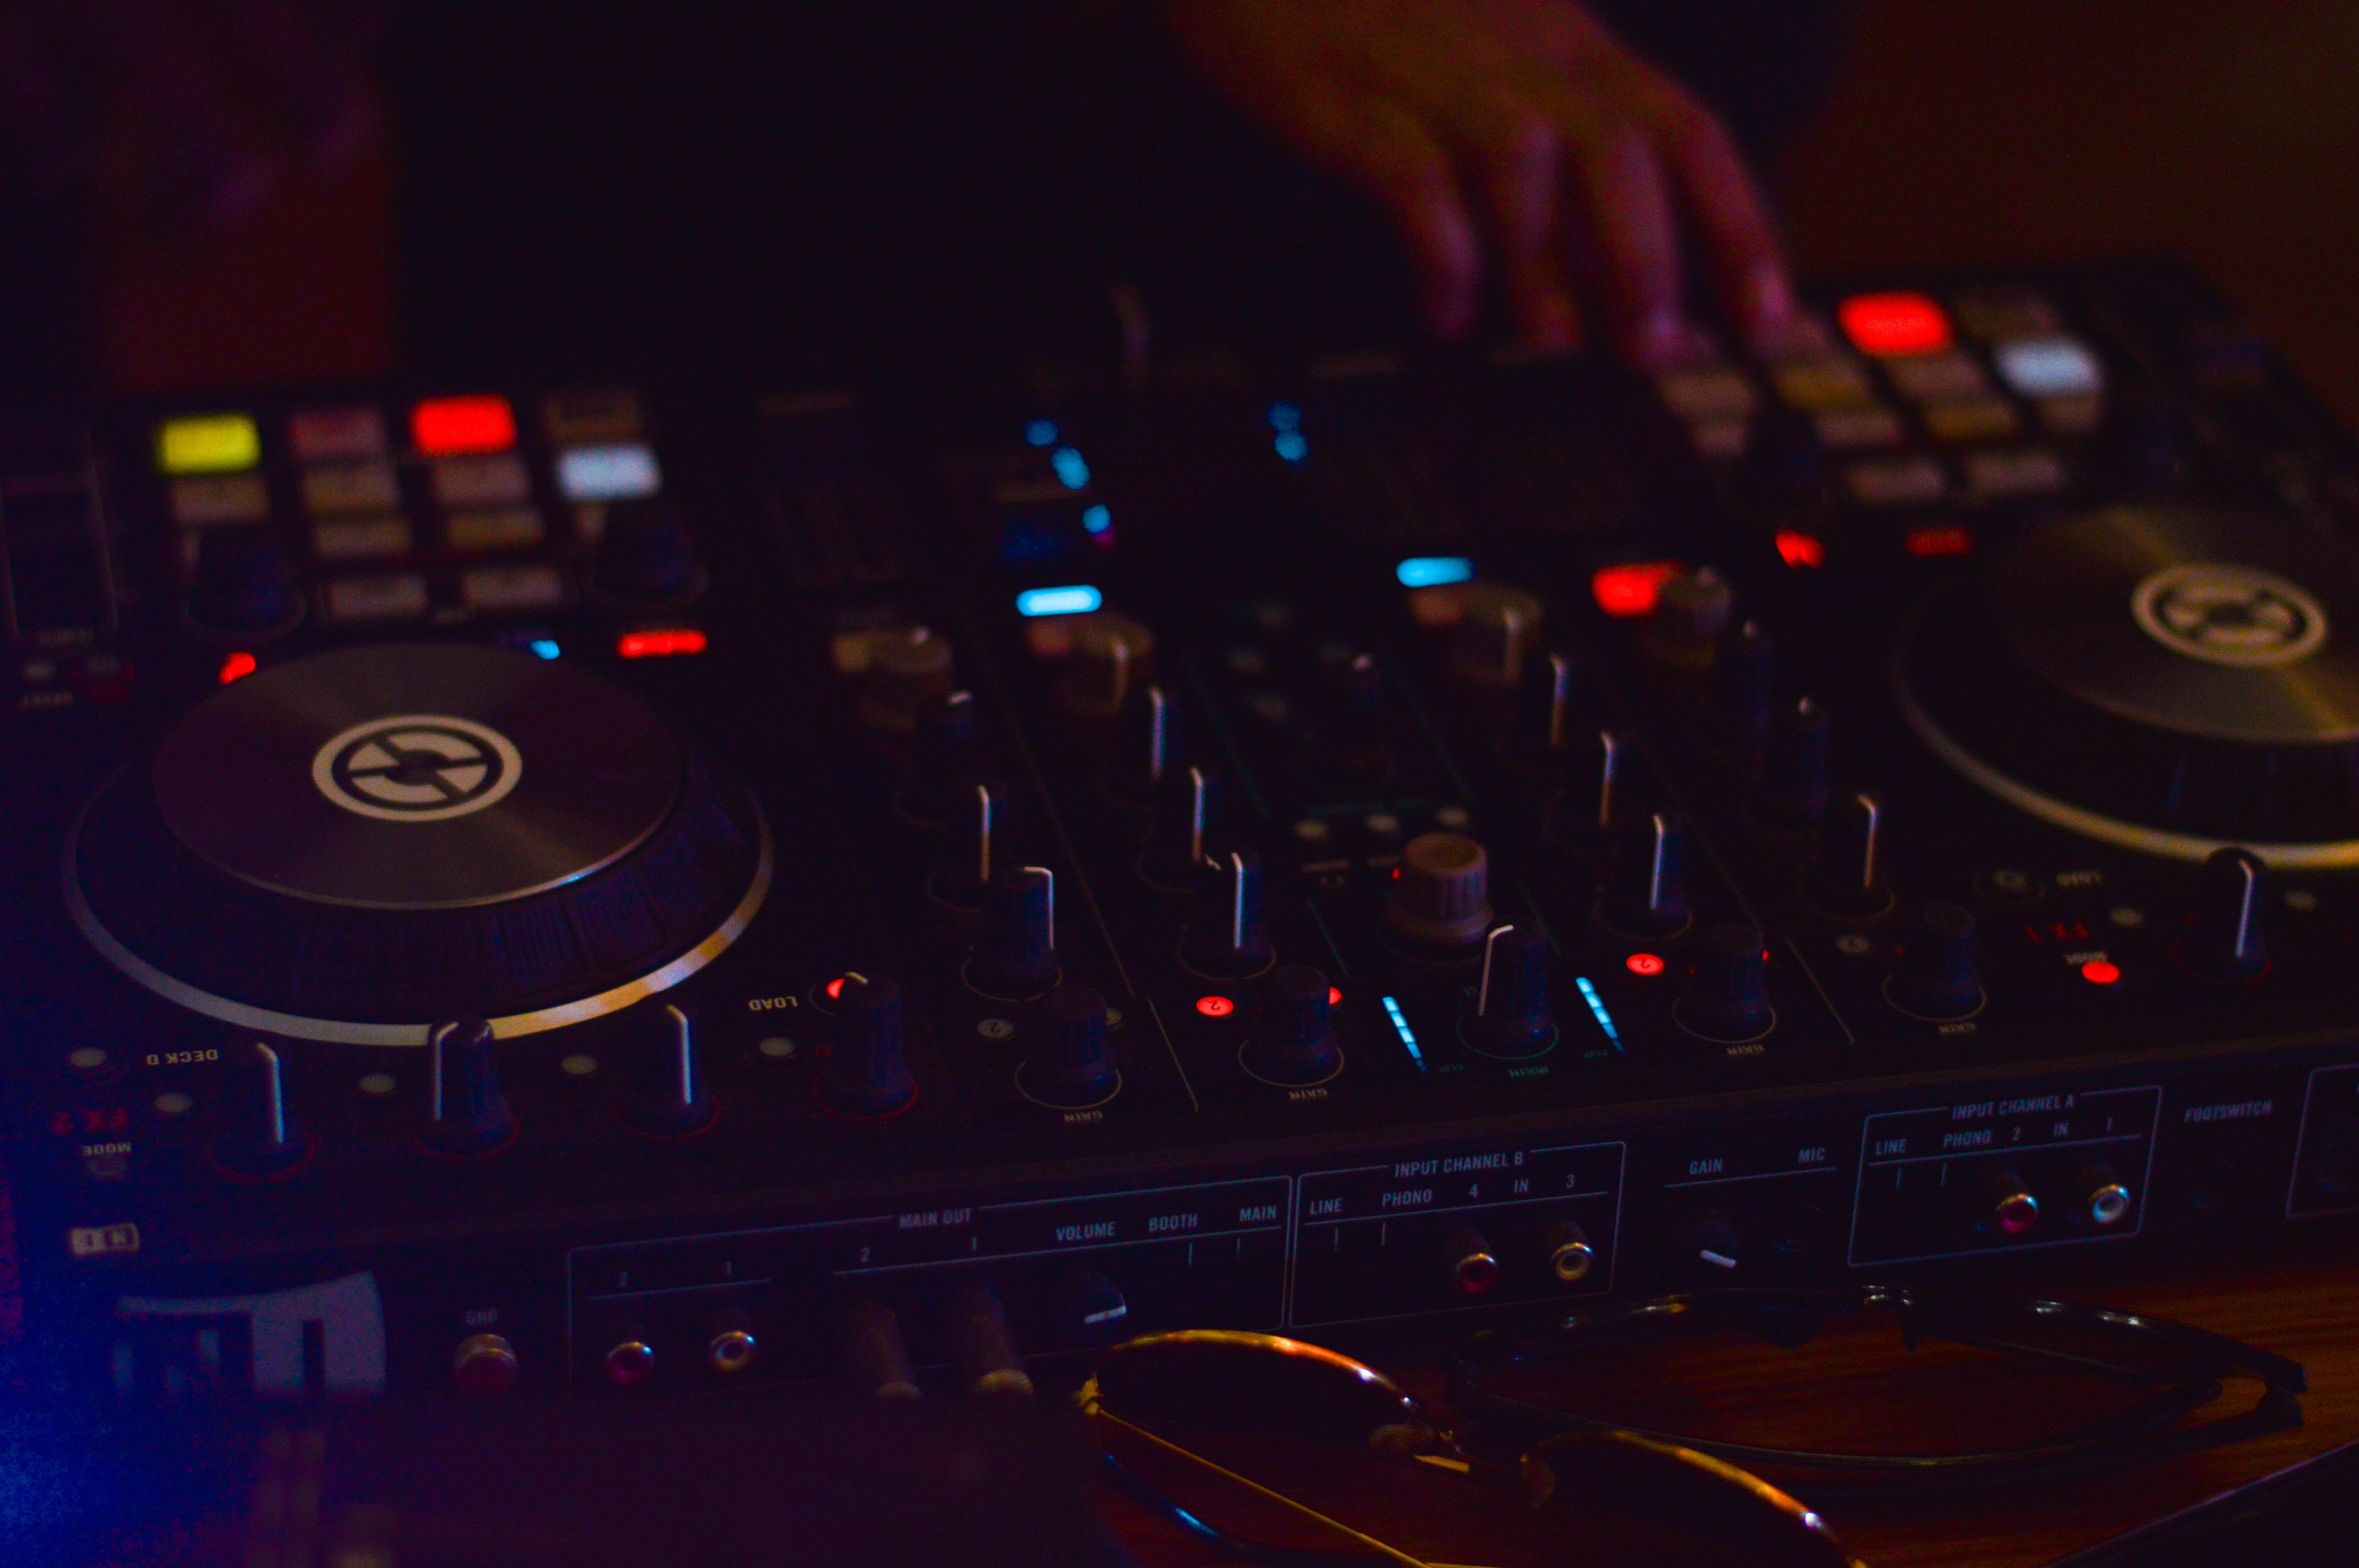 dj-deck